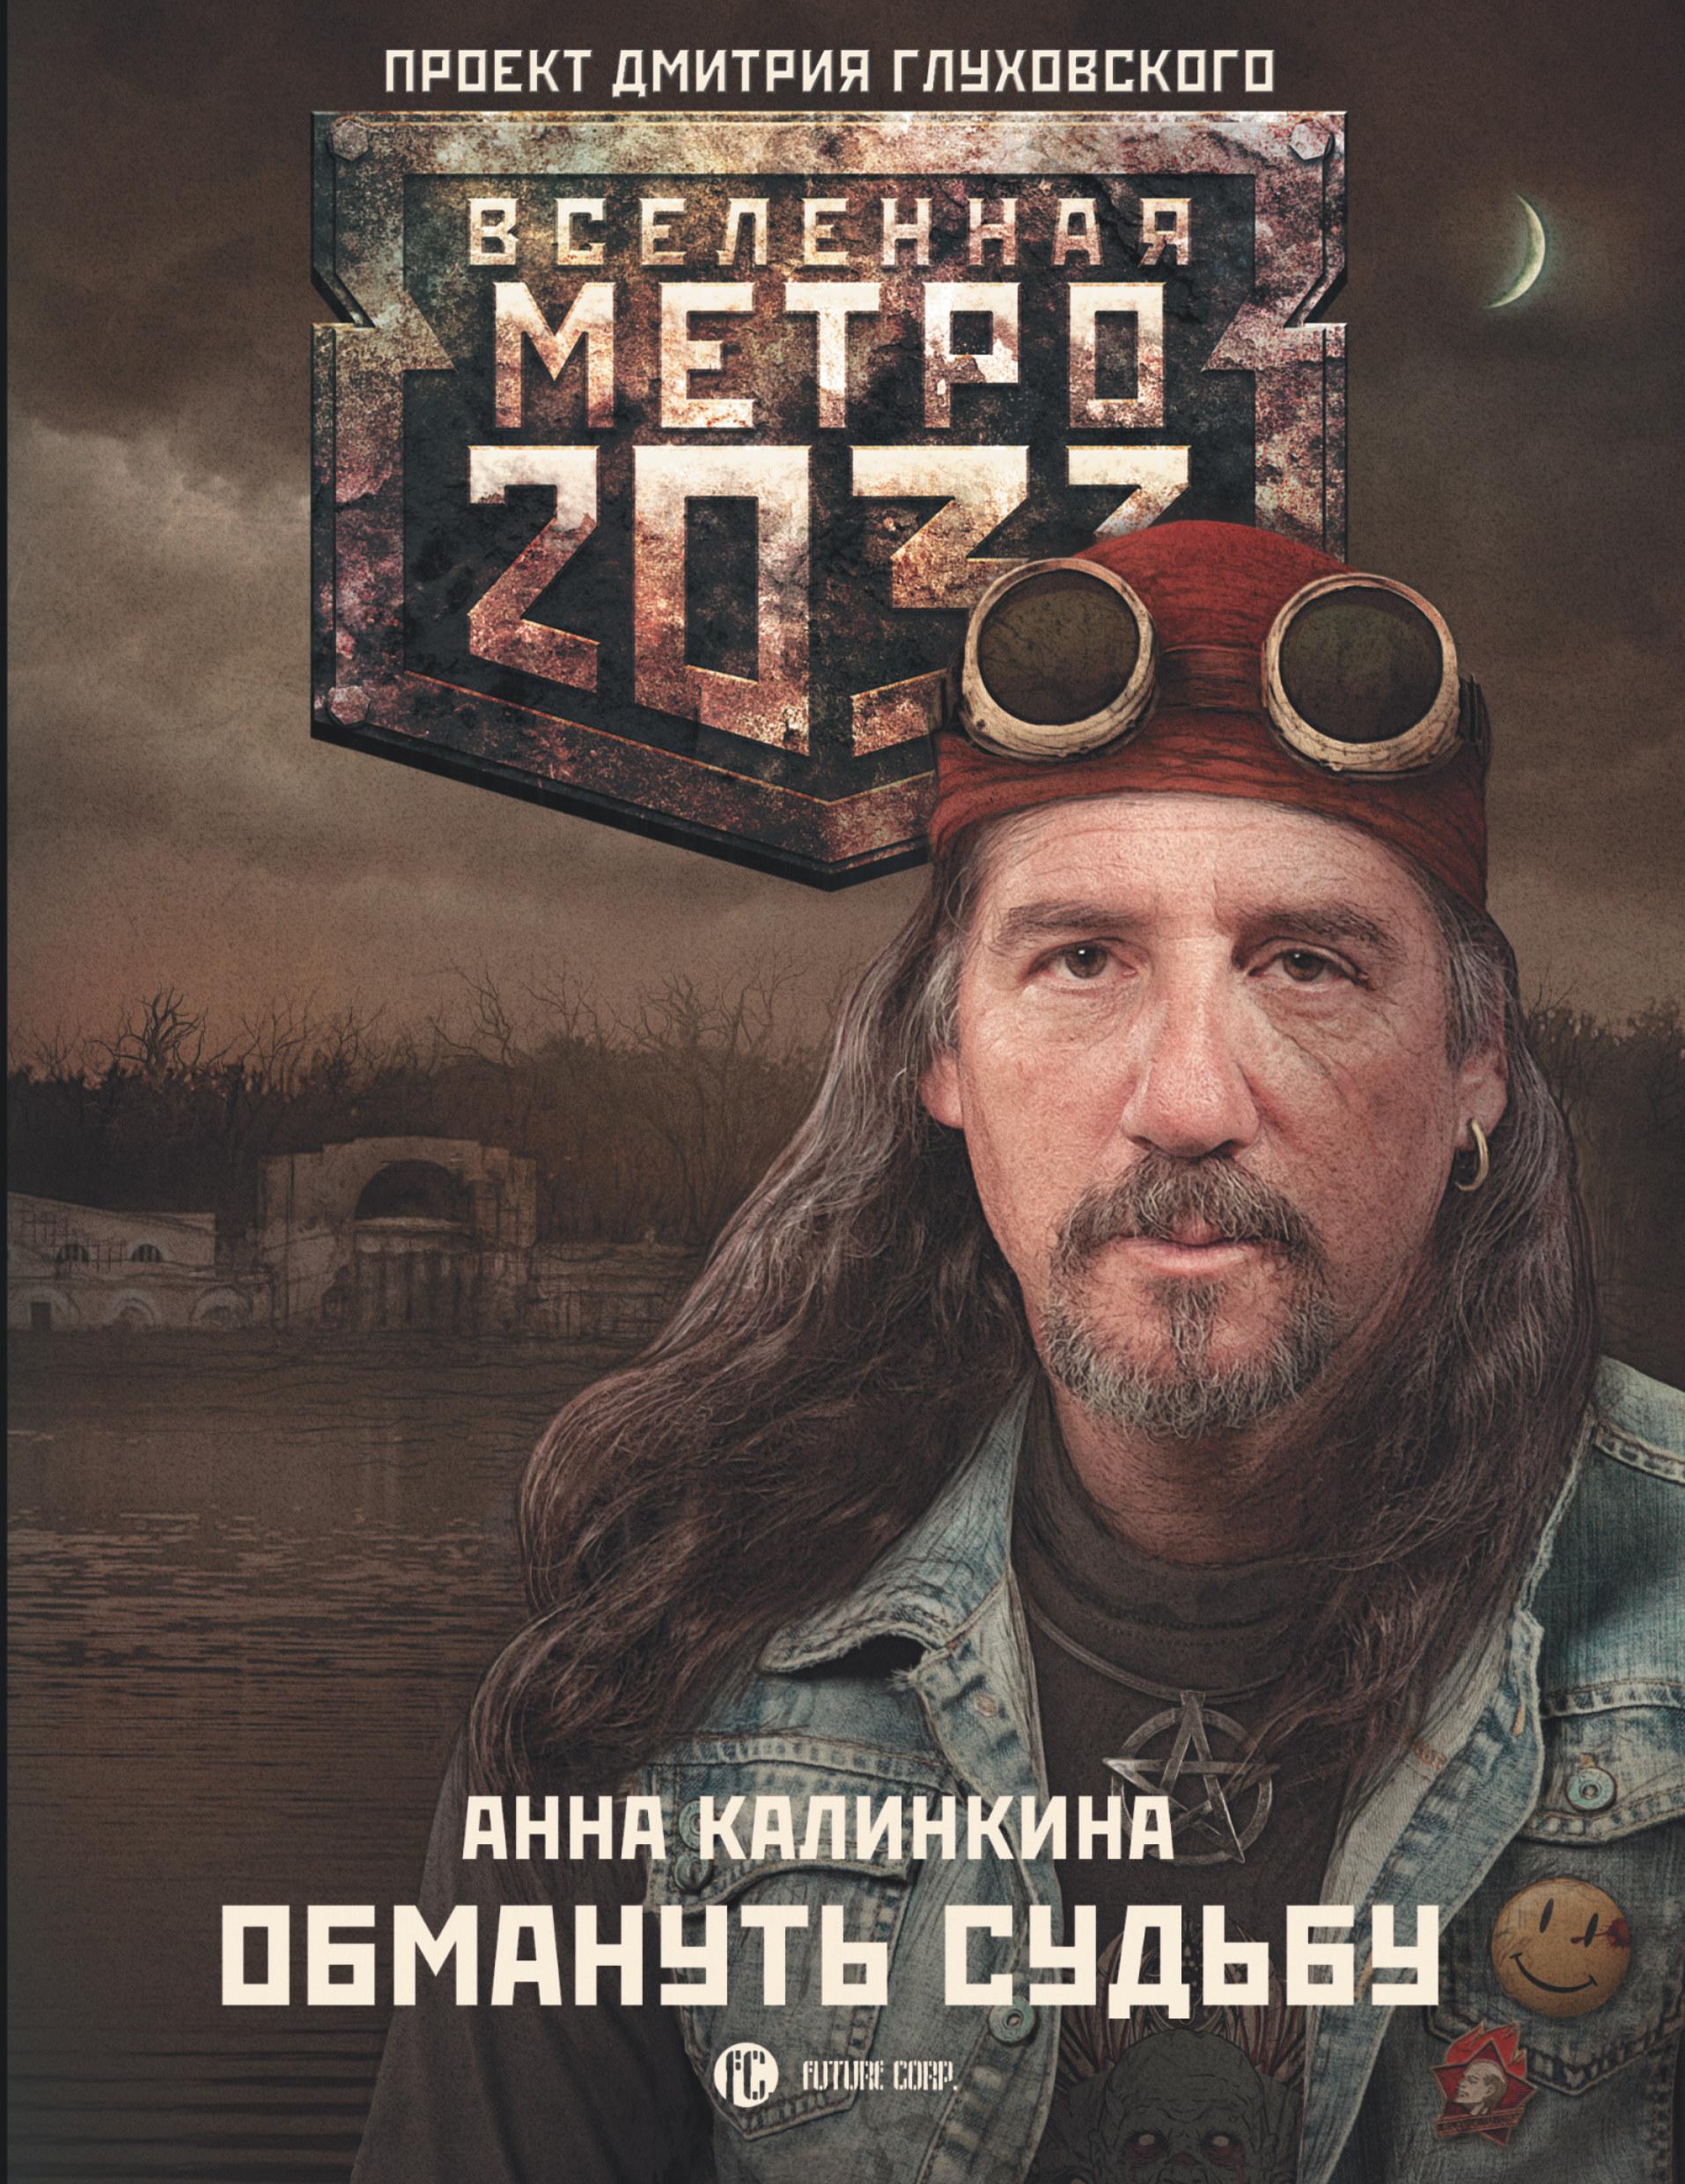 Калинкина А.В. Метро 2033: Обмануть судьбу